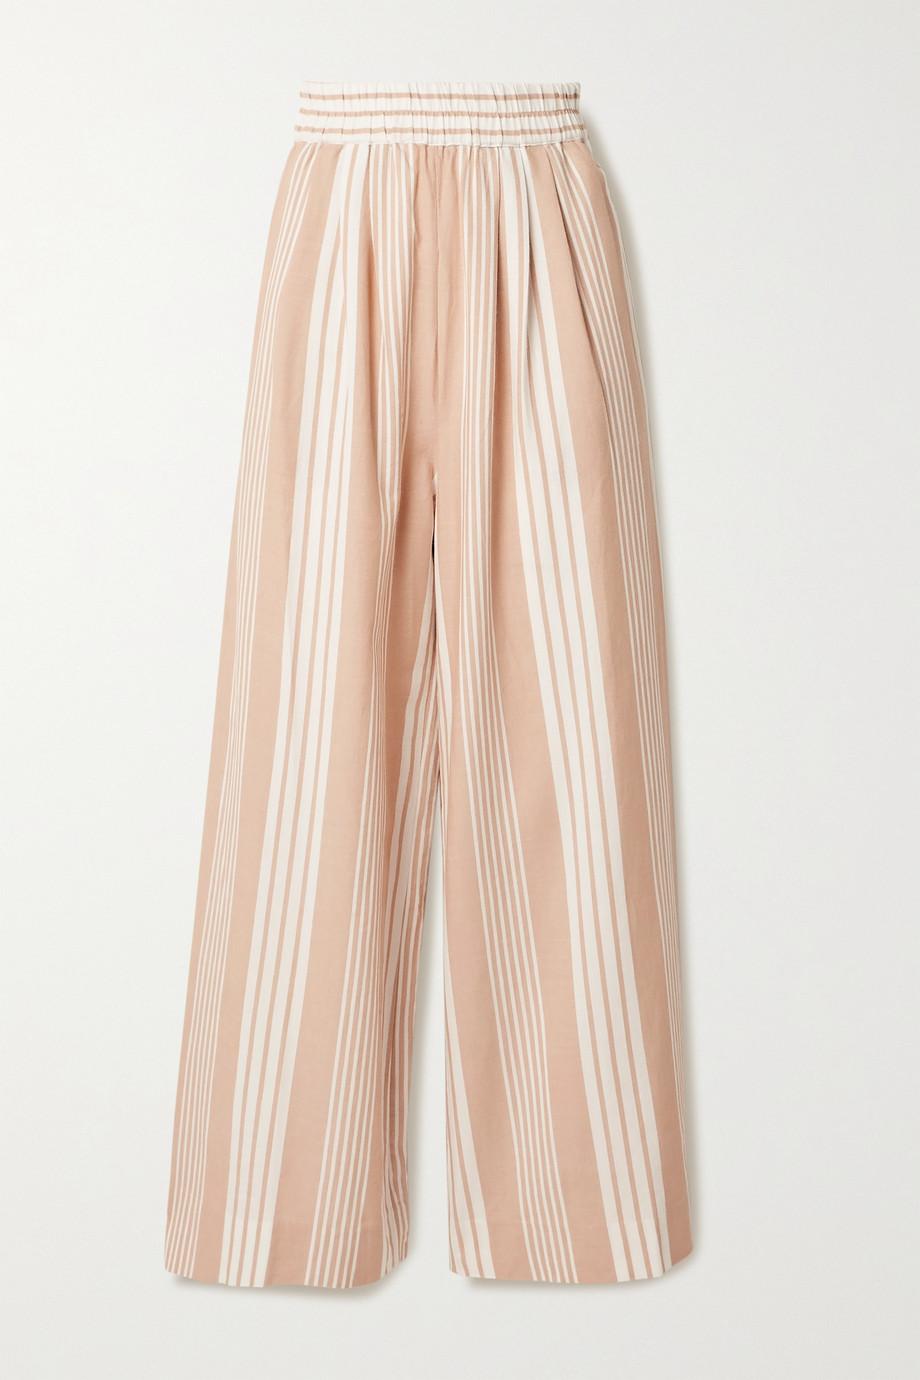 Mara Hoffman + NET SUSTAIN Paloma striped TENCEL Lyocell and organic cotton-blend wide-leg pants